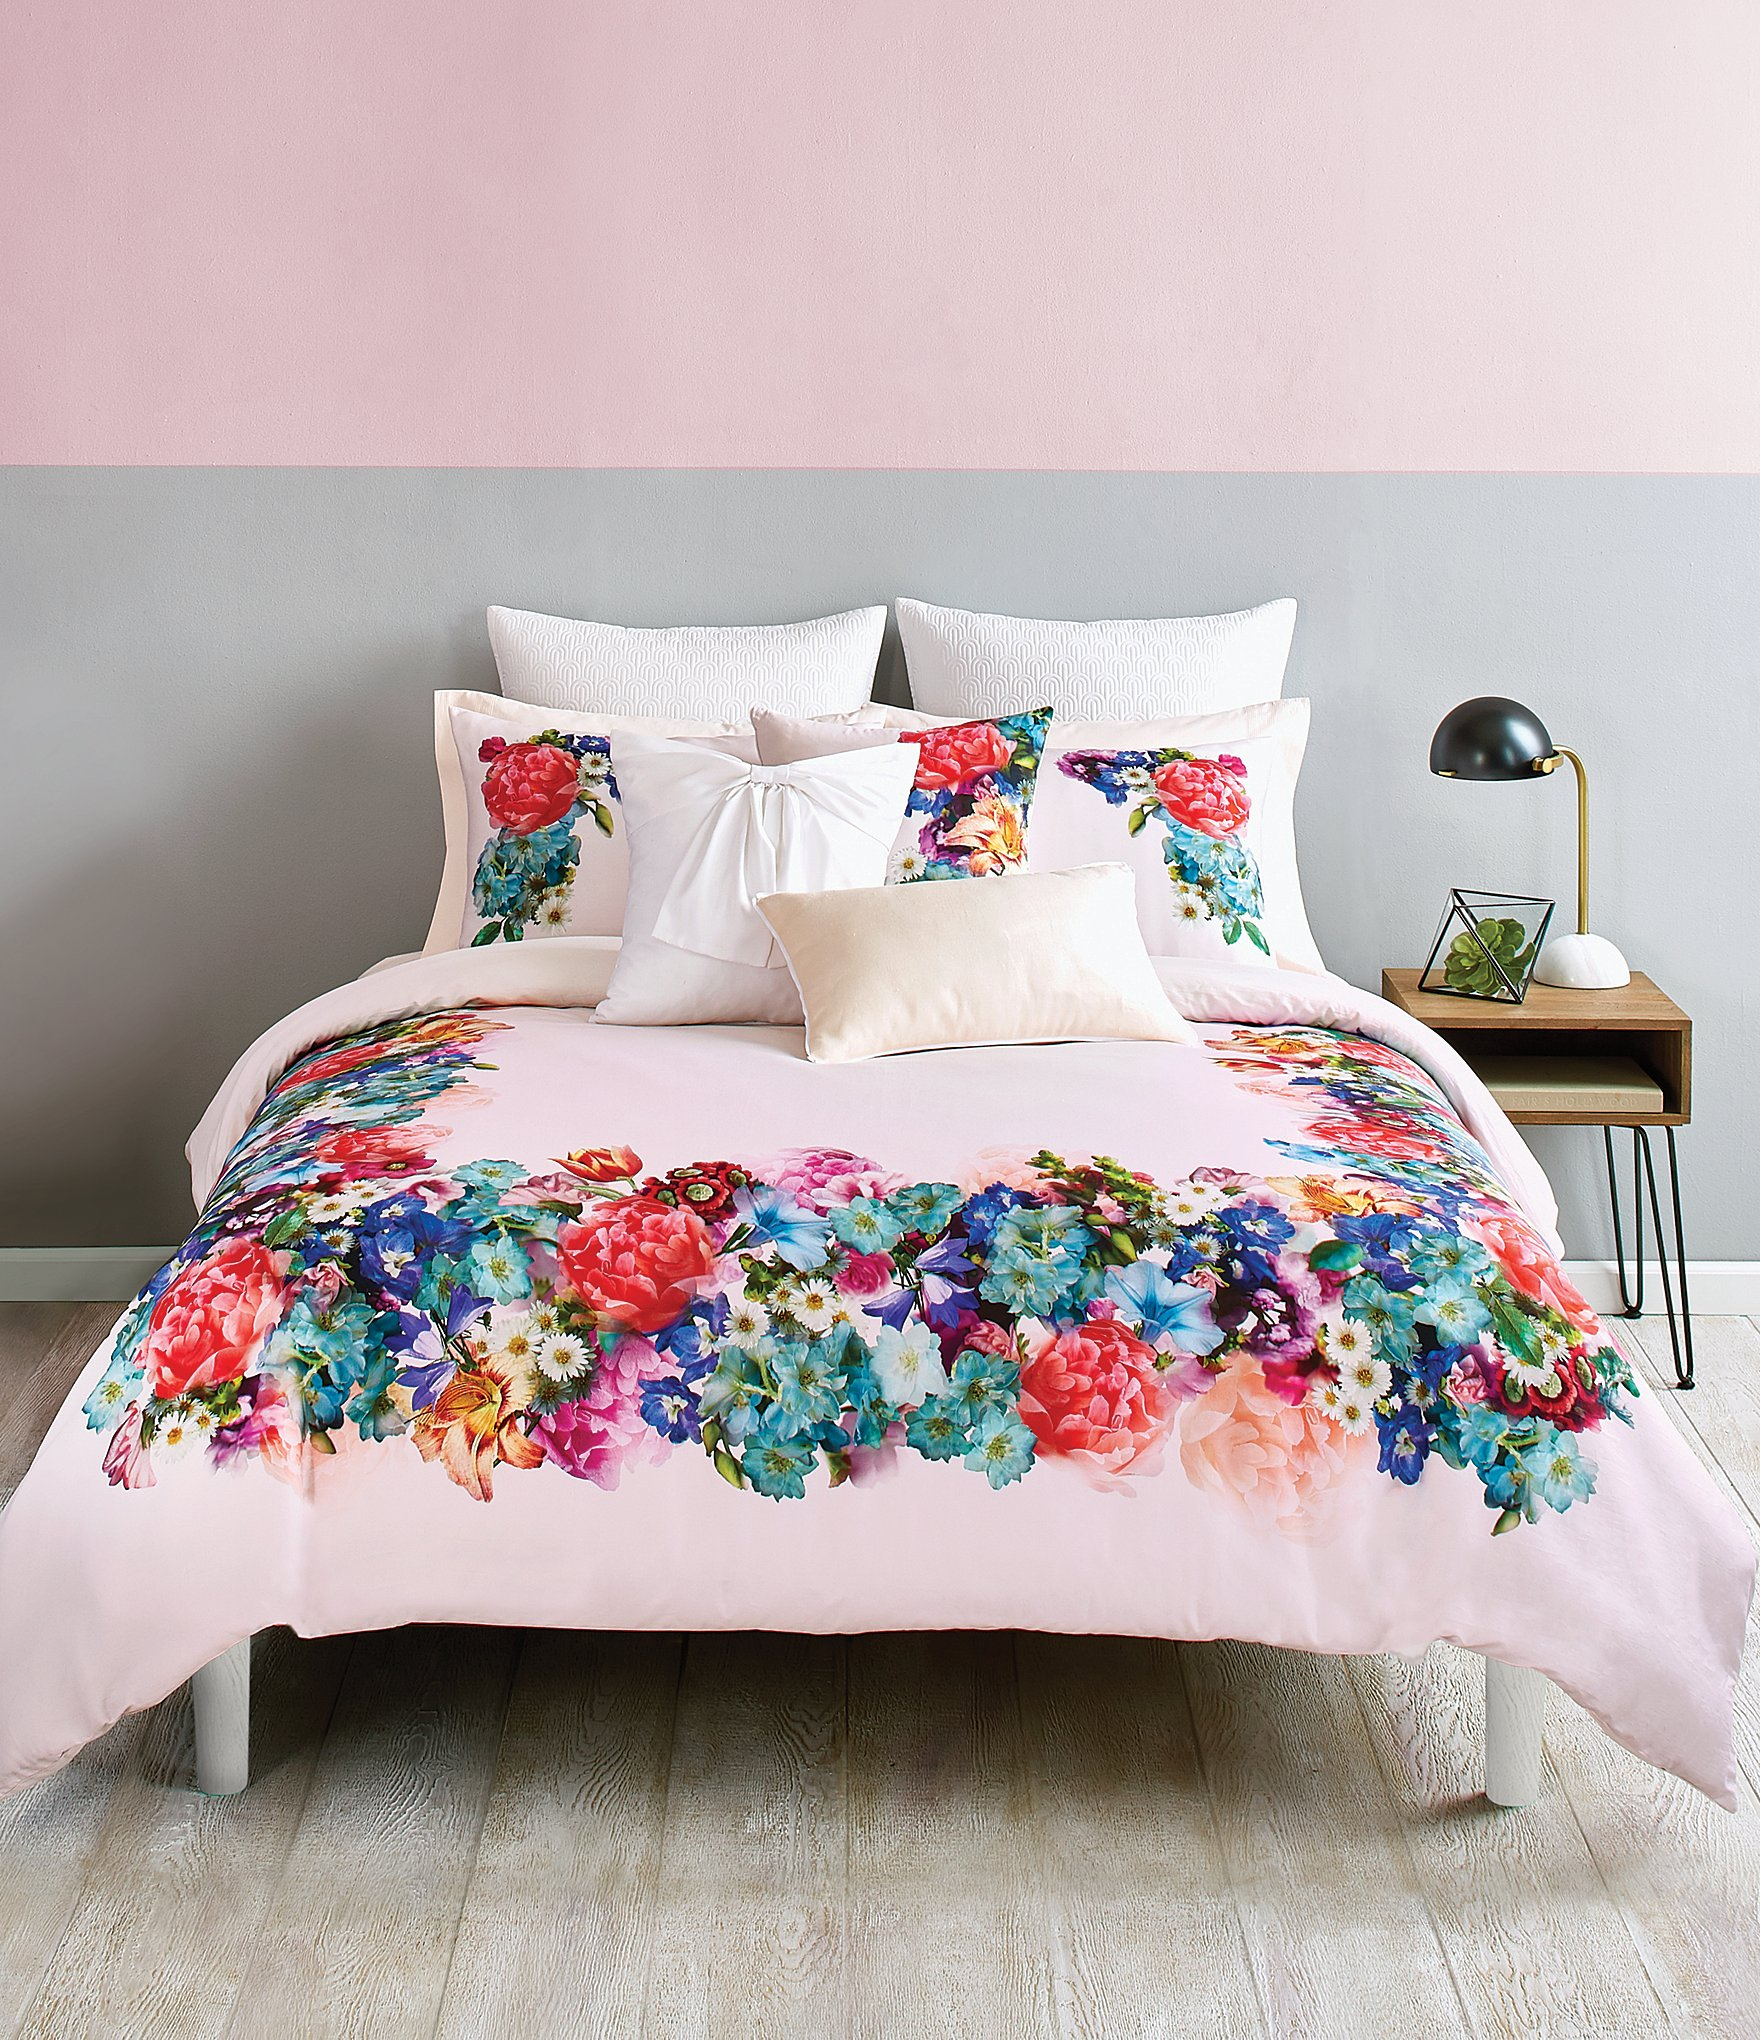 Kate Spade Duvet Cover Home Bedding Dillardscom